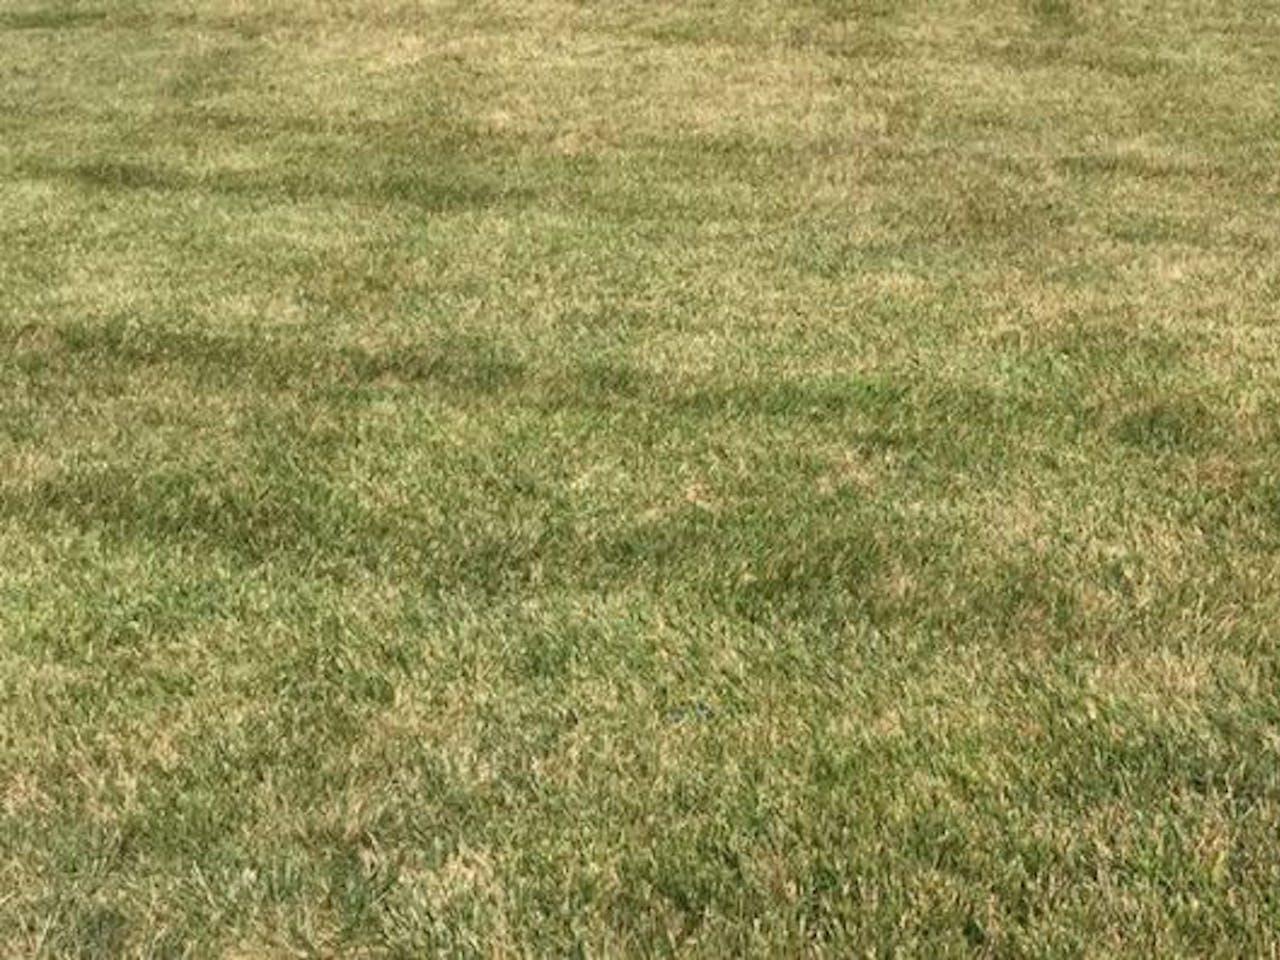 Yellow Grass